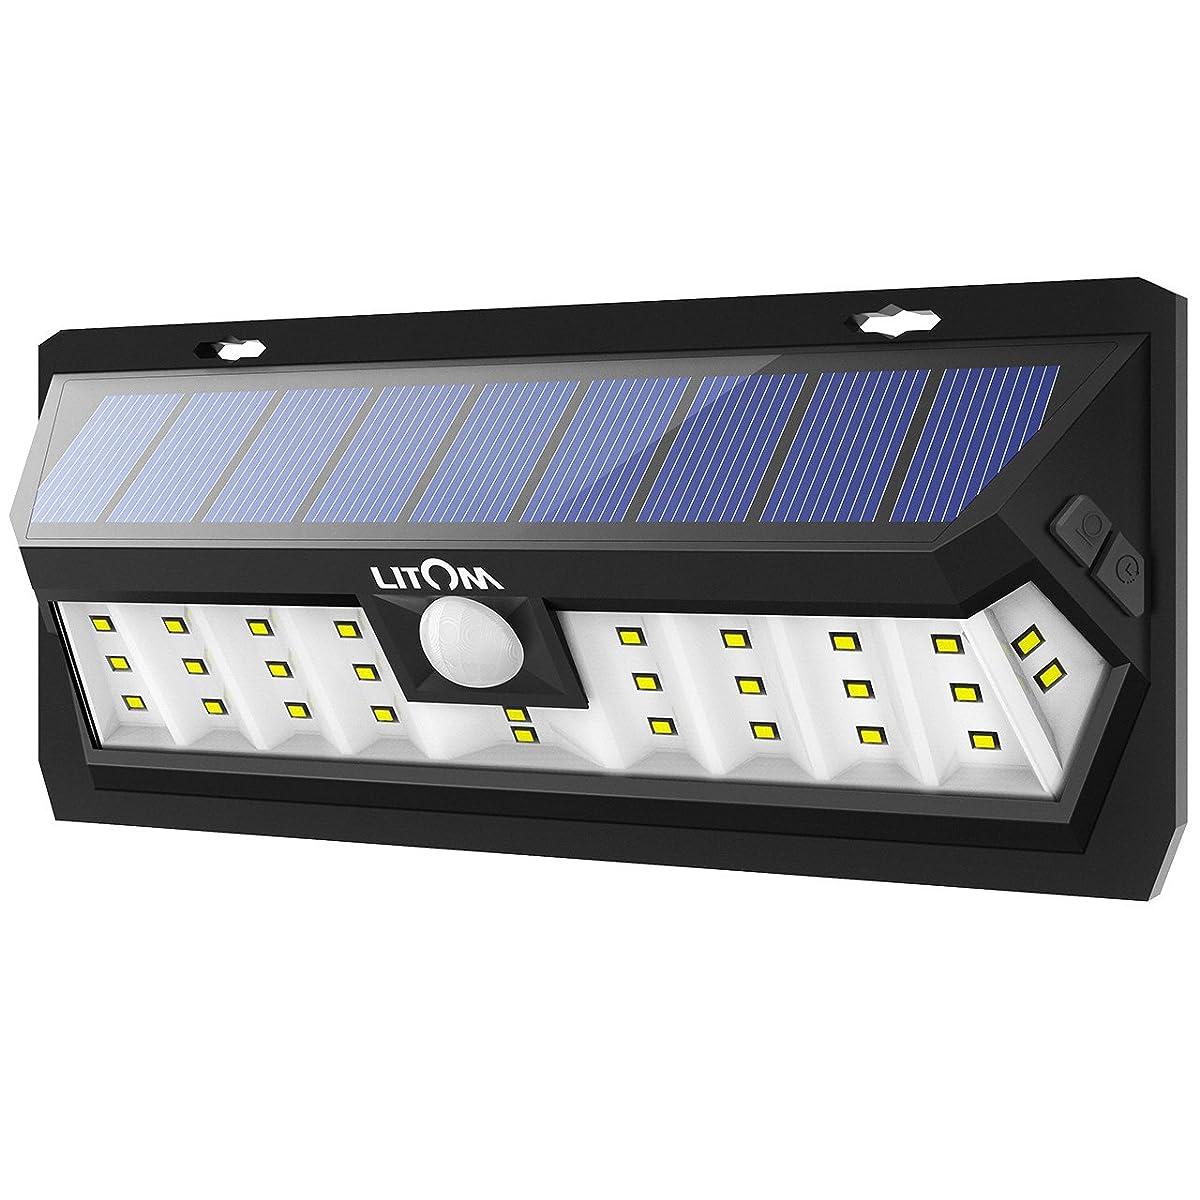 Litom Solar Lights Outdoor 30 LED, Adjustable Lighting Time Solar Motion Sensor Light with Wide Angle and Waterproof Design, Wireless Solar Lighting for Garden Yard Patio